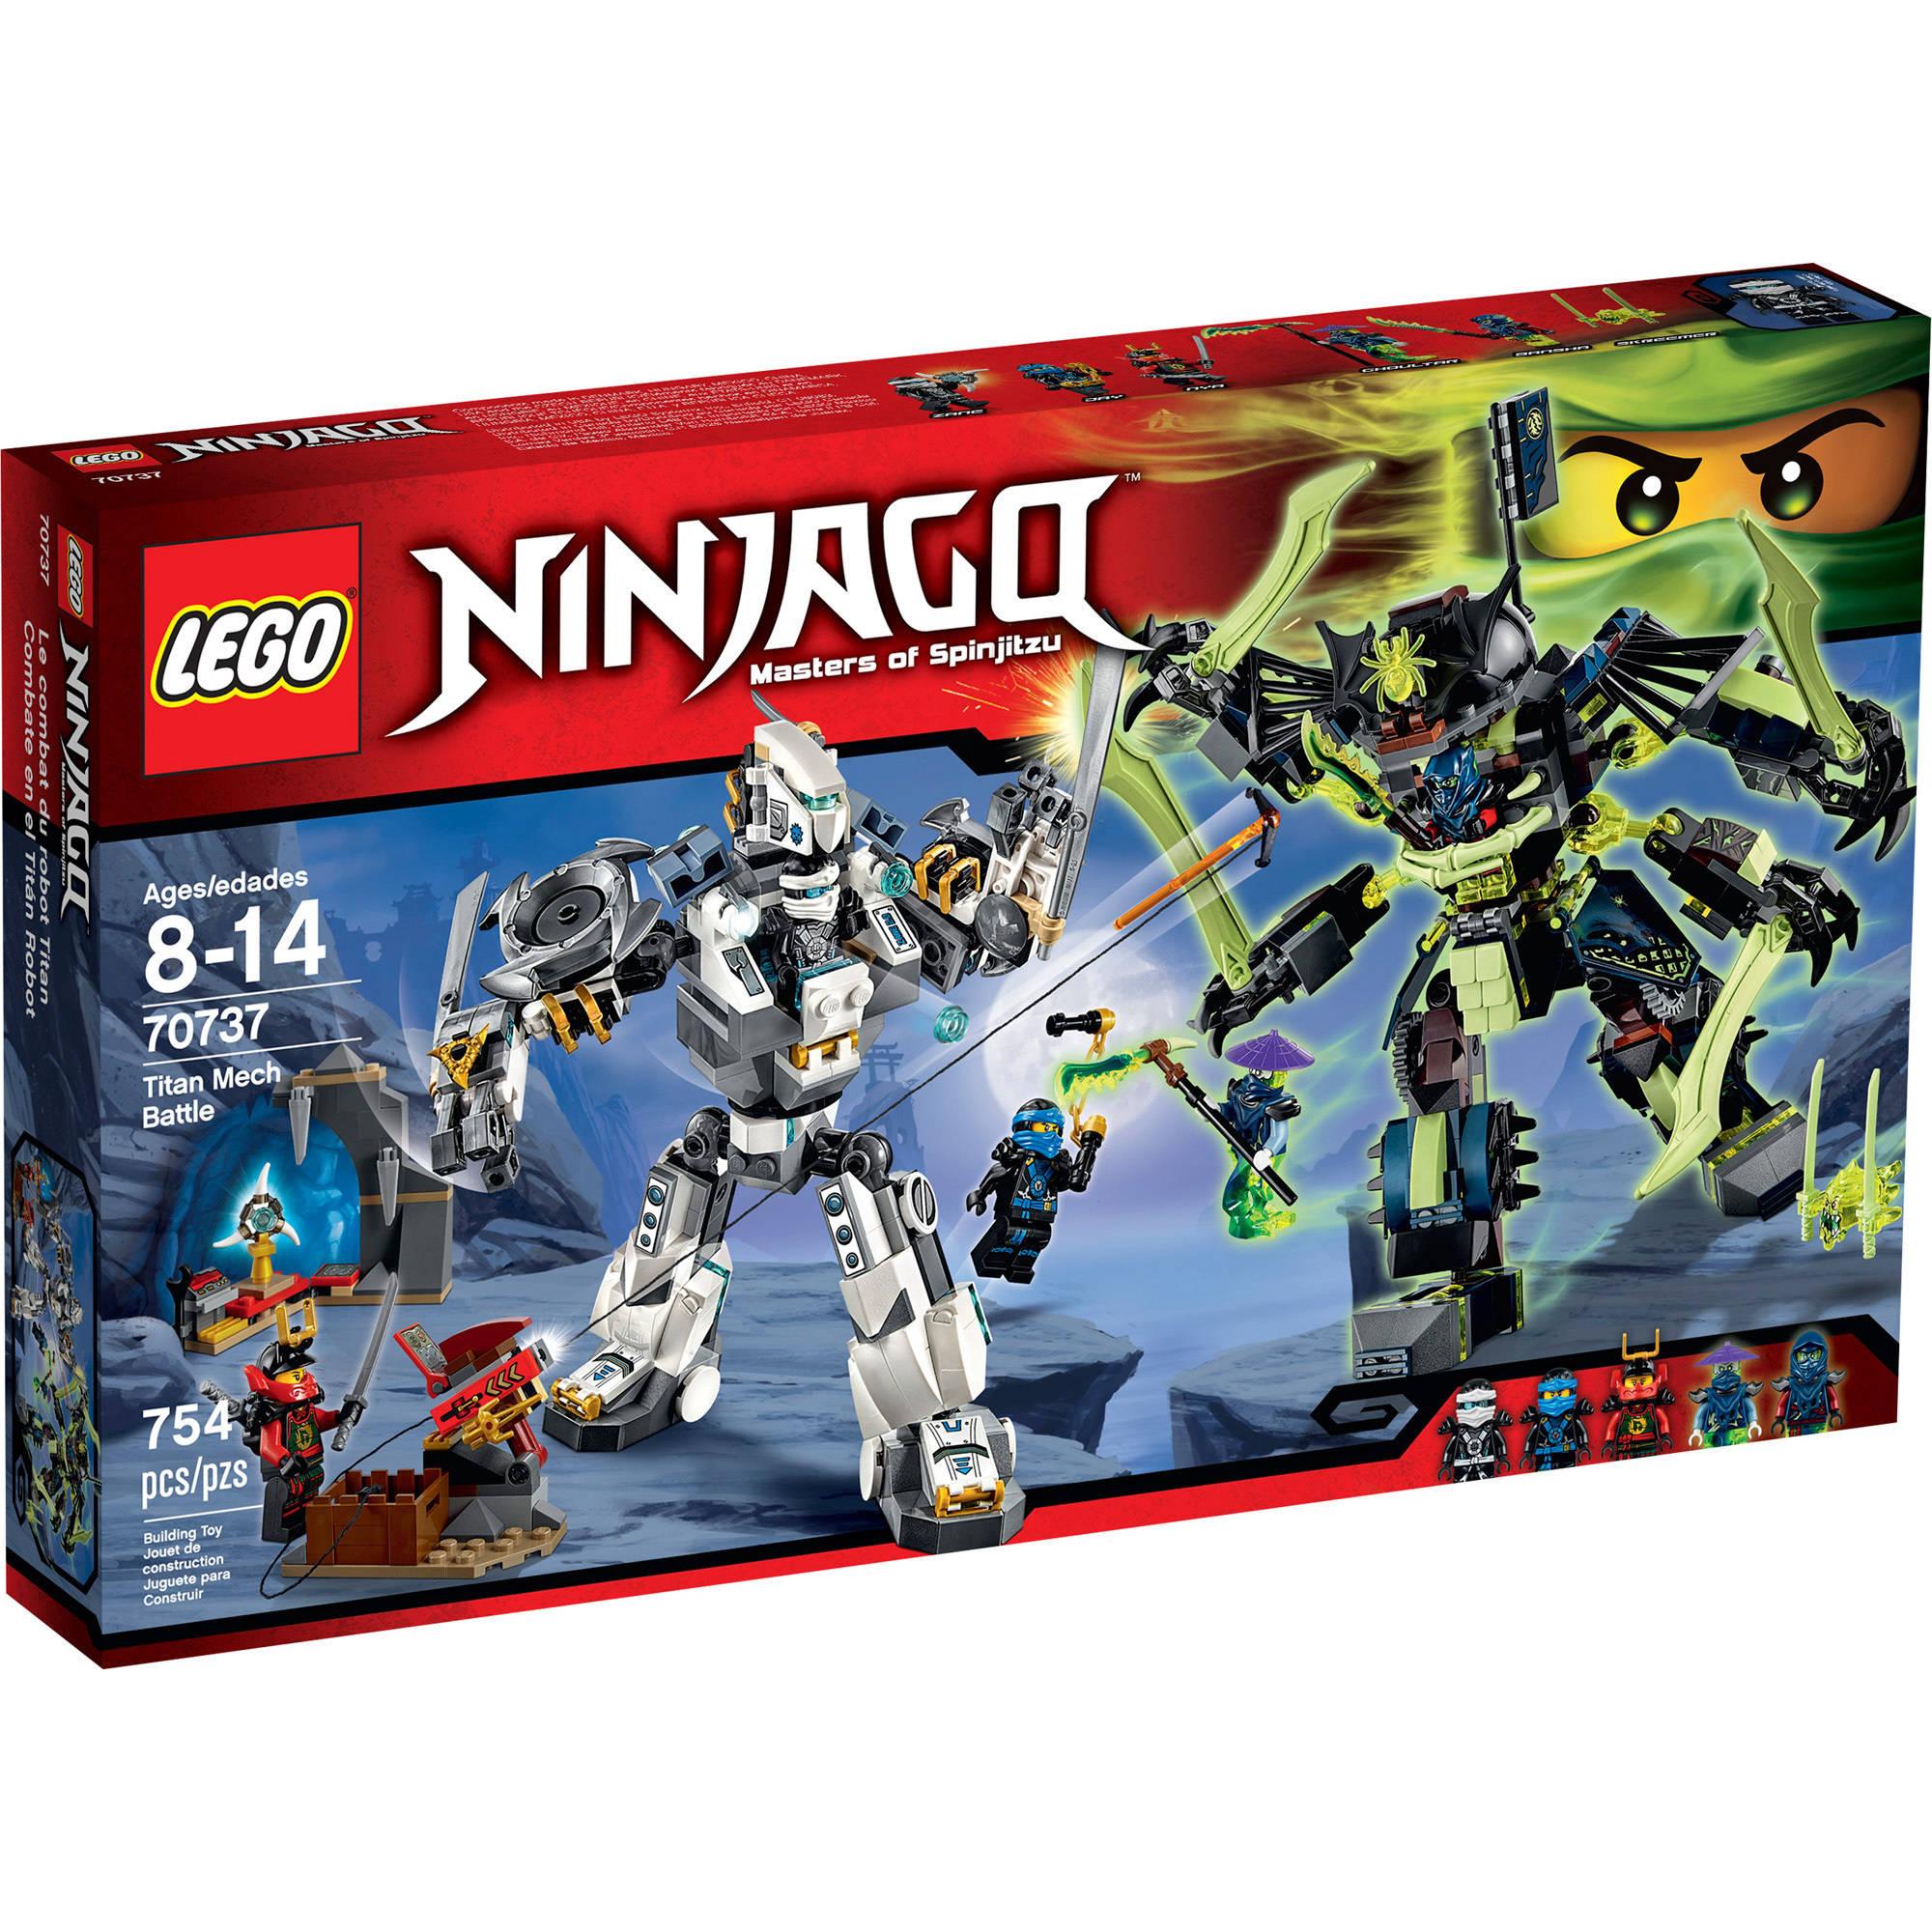 Lego Ninjago Titan Mech Battle, 70737